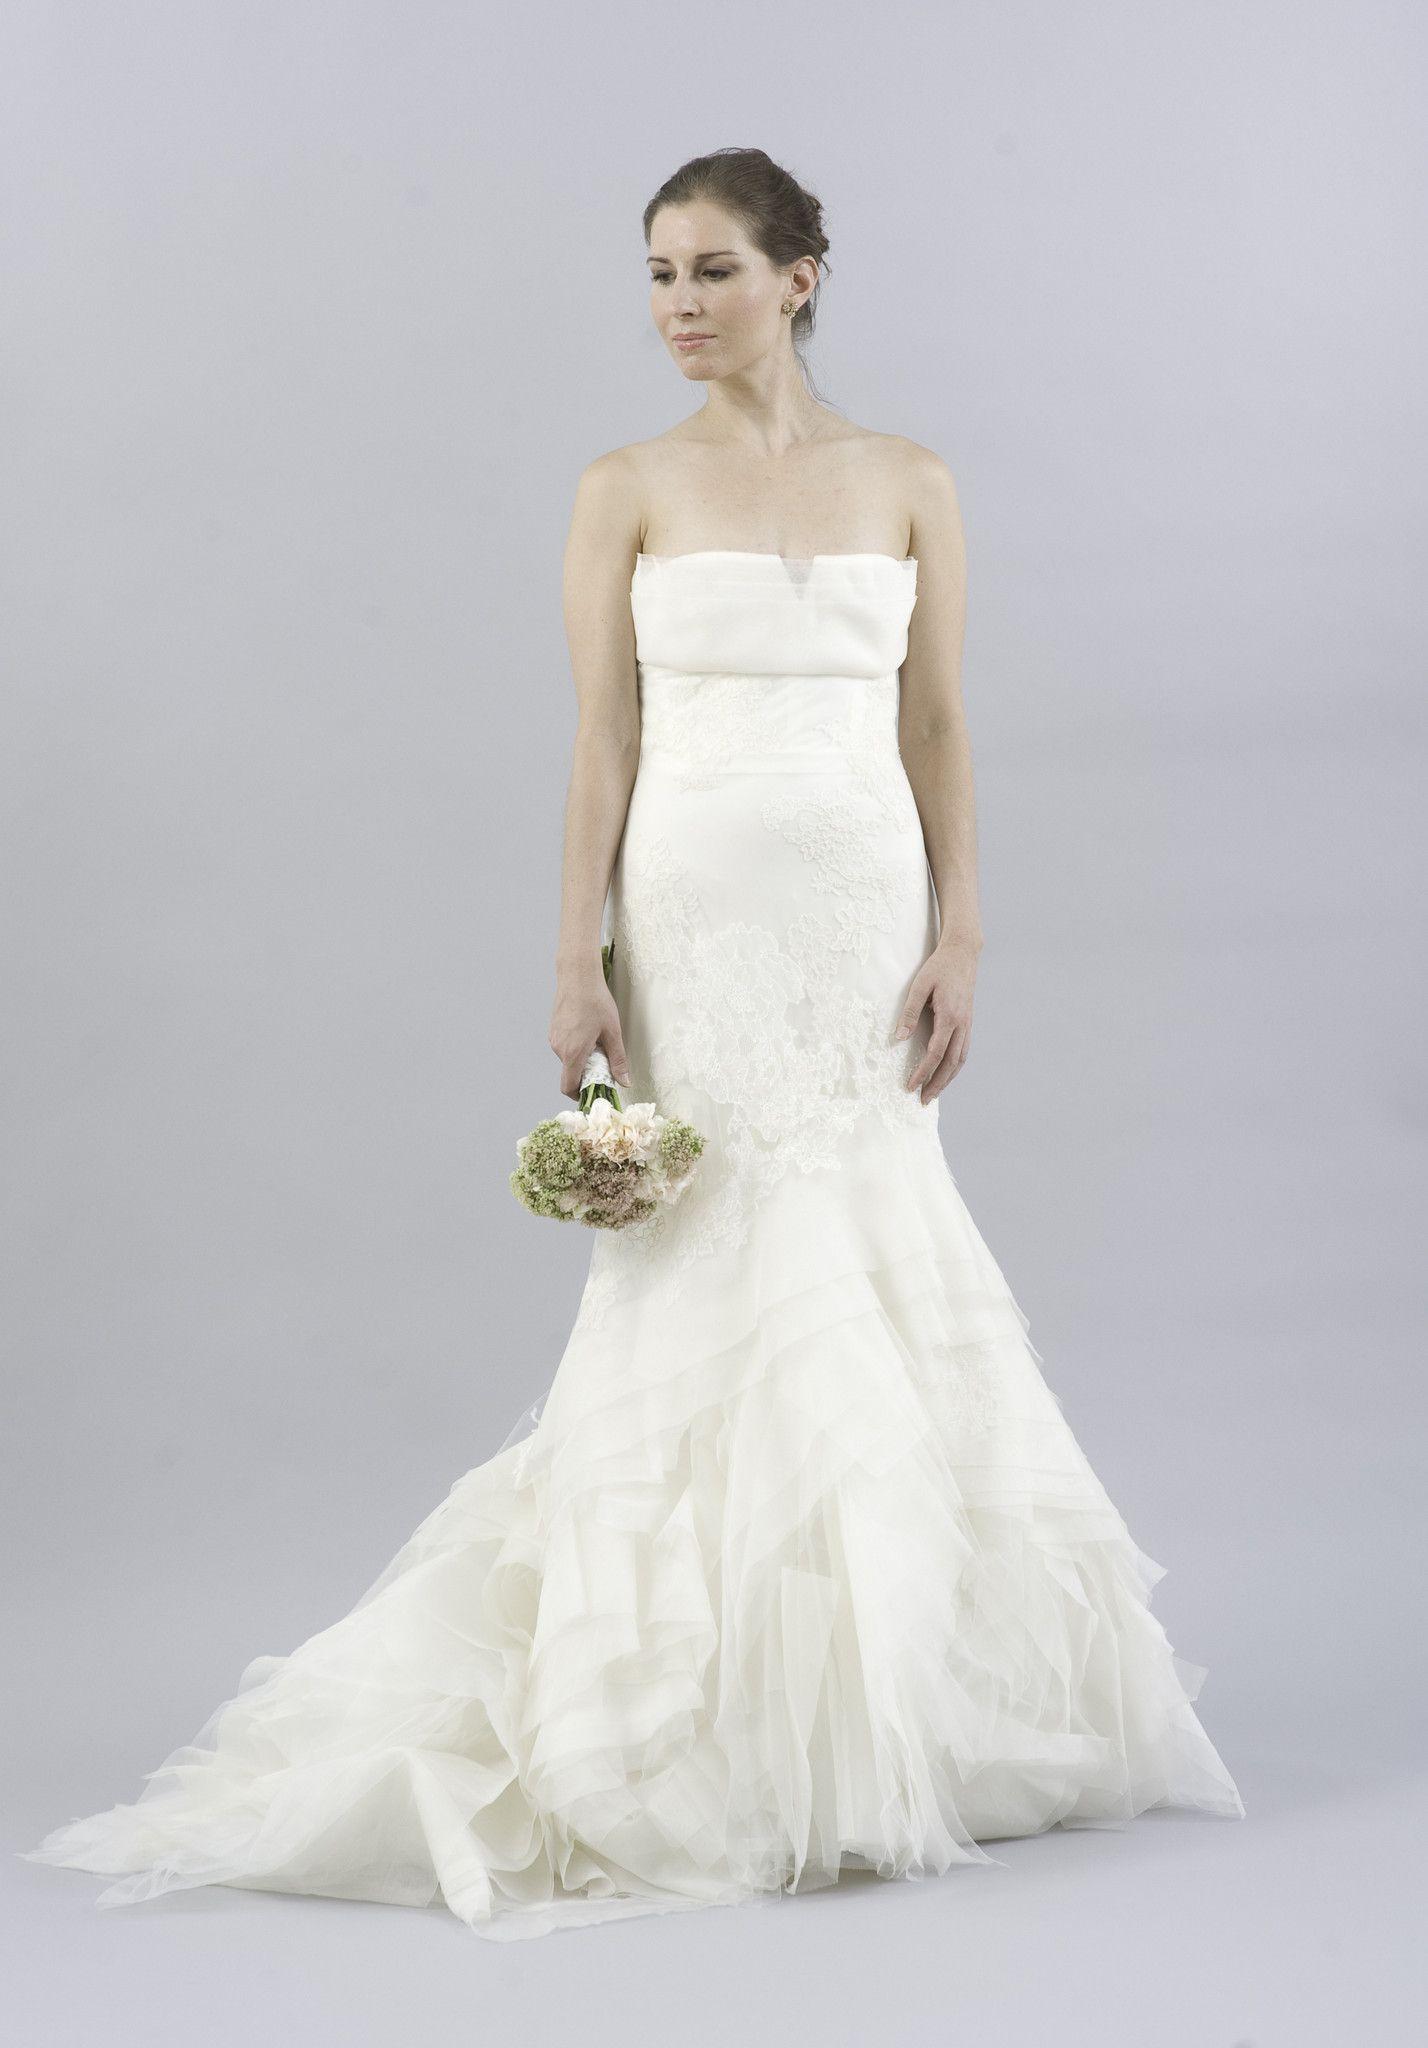 Vera Wang Fawn Organza and Lace Dress | Shop Nearly Newly Wed ...